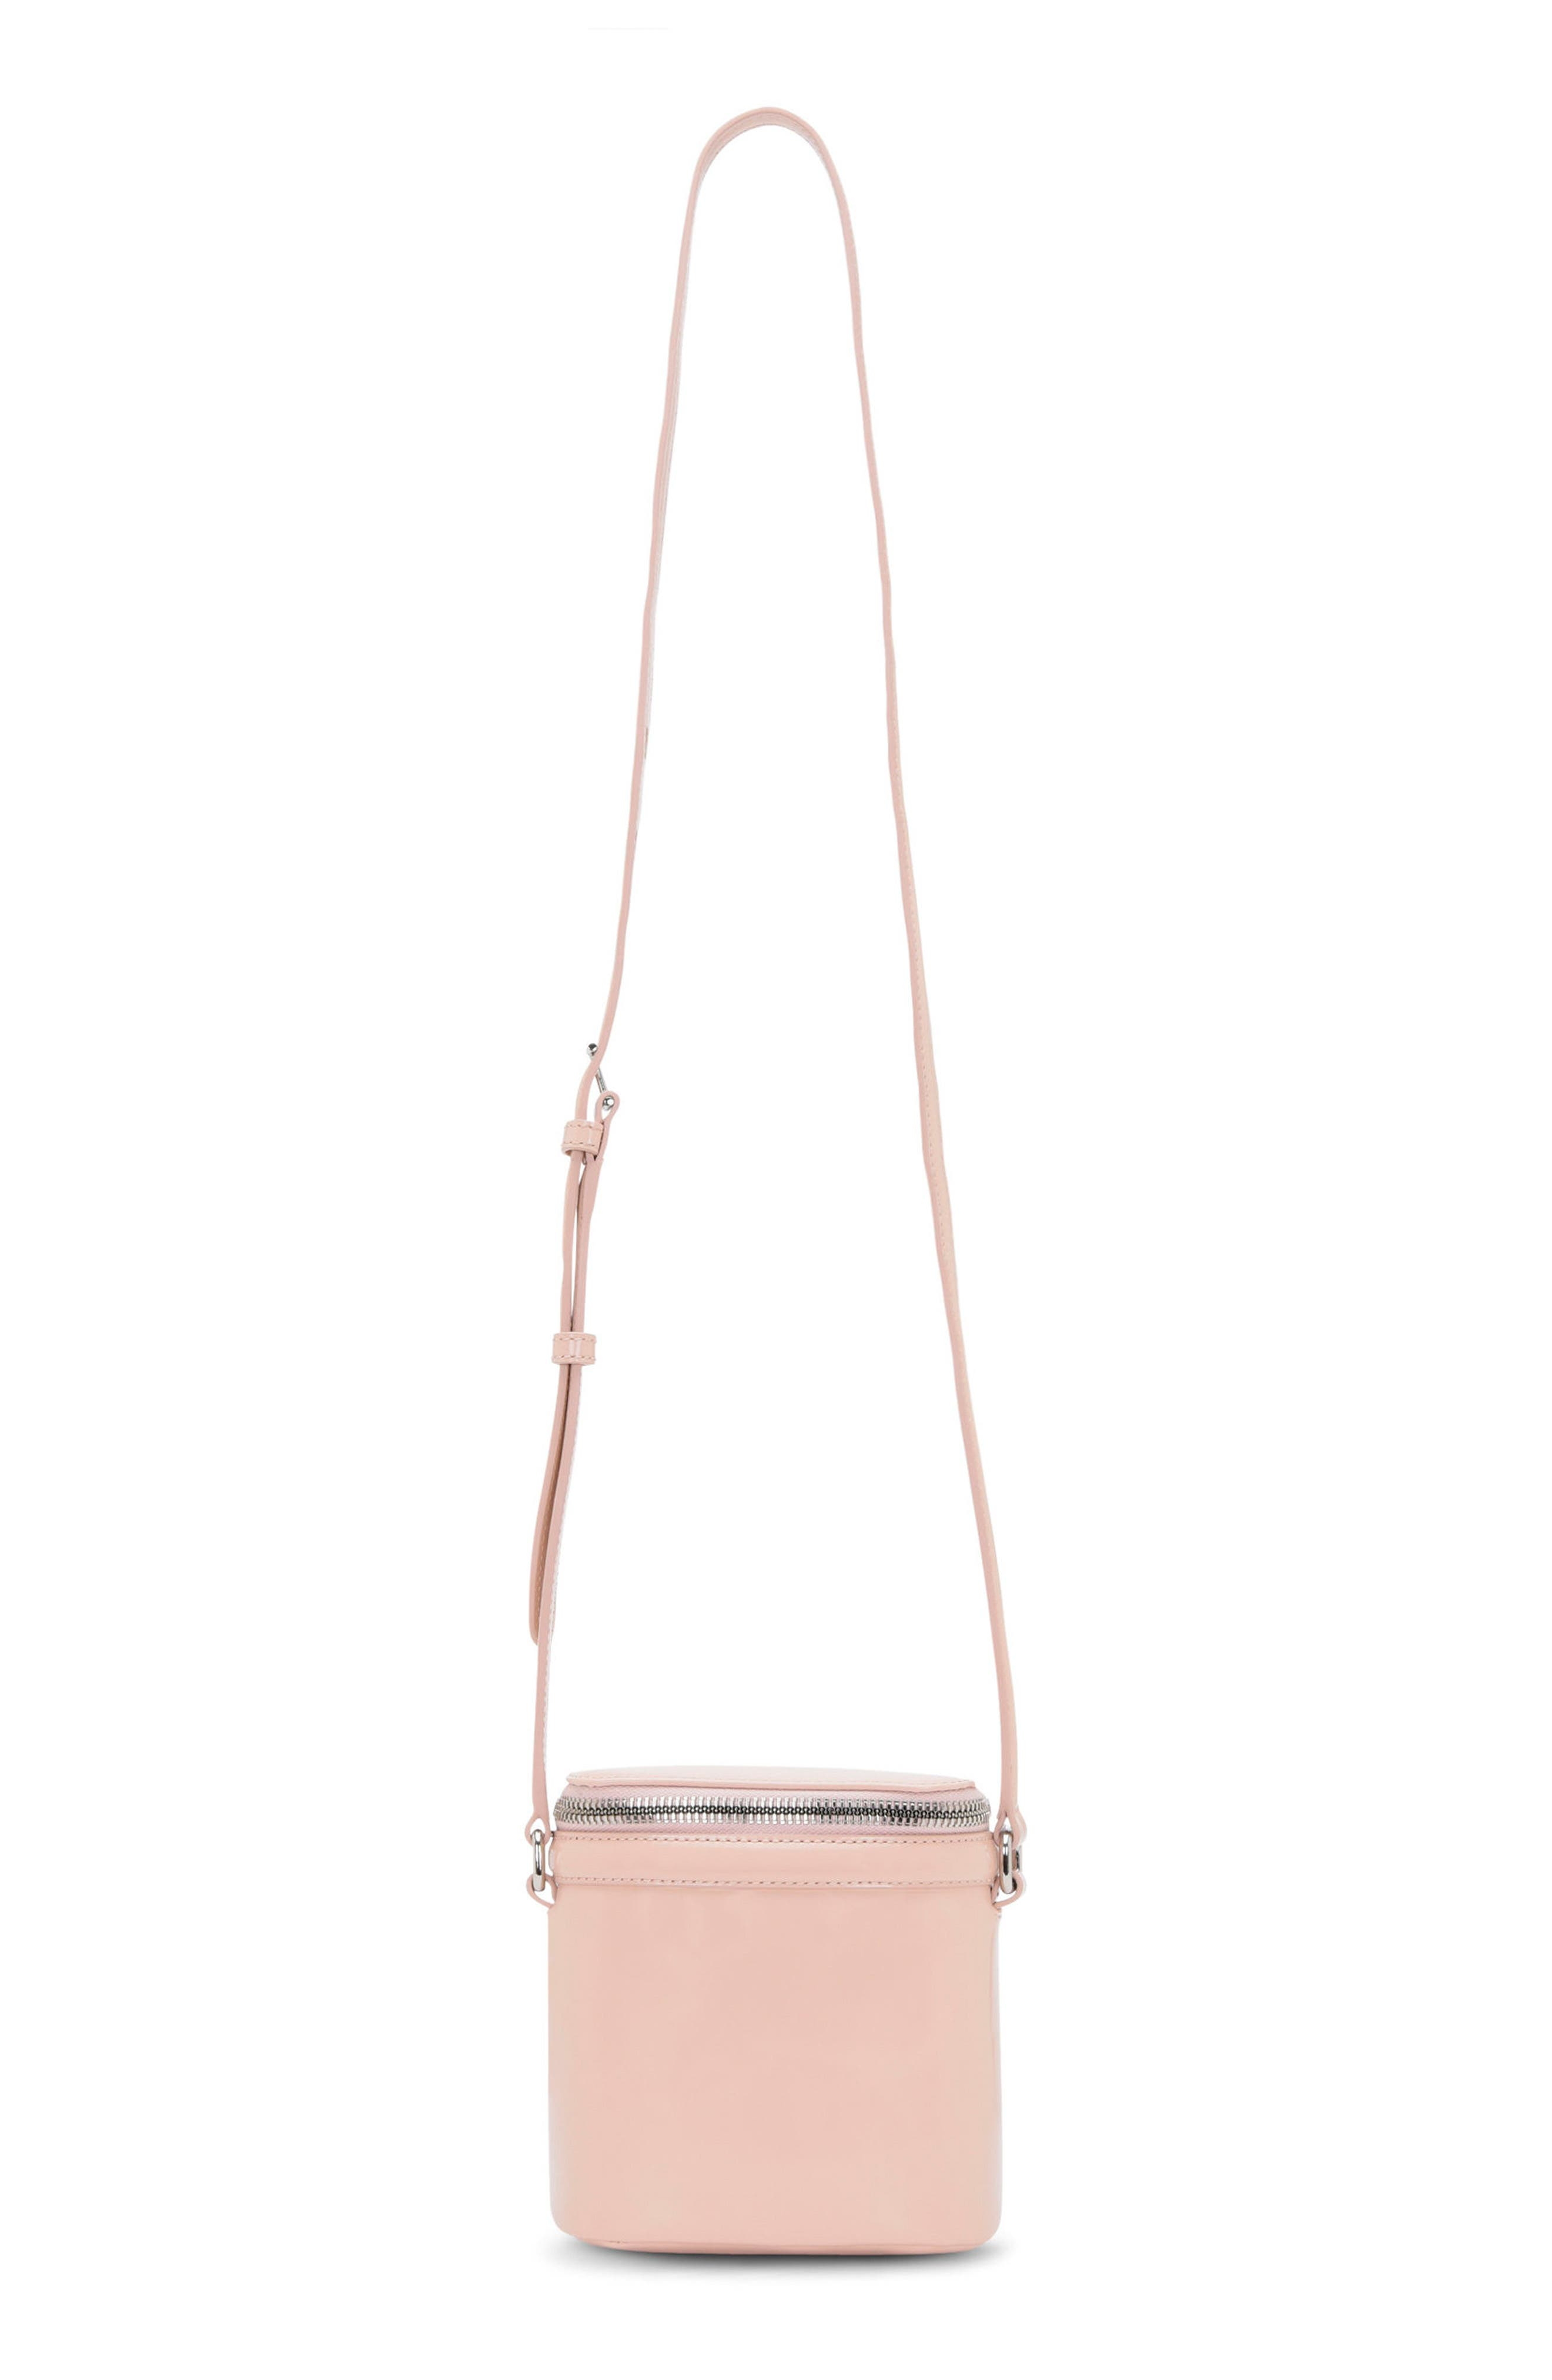 KARA Stowaway Leather Crossbody Bag